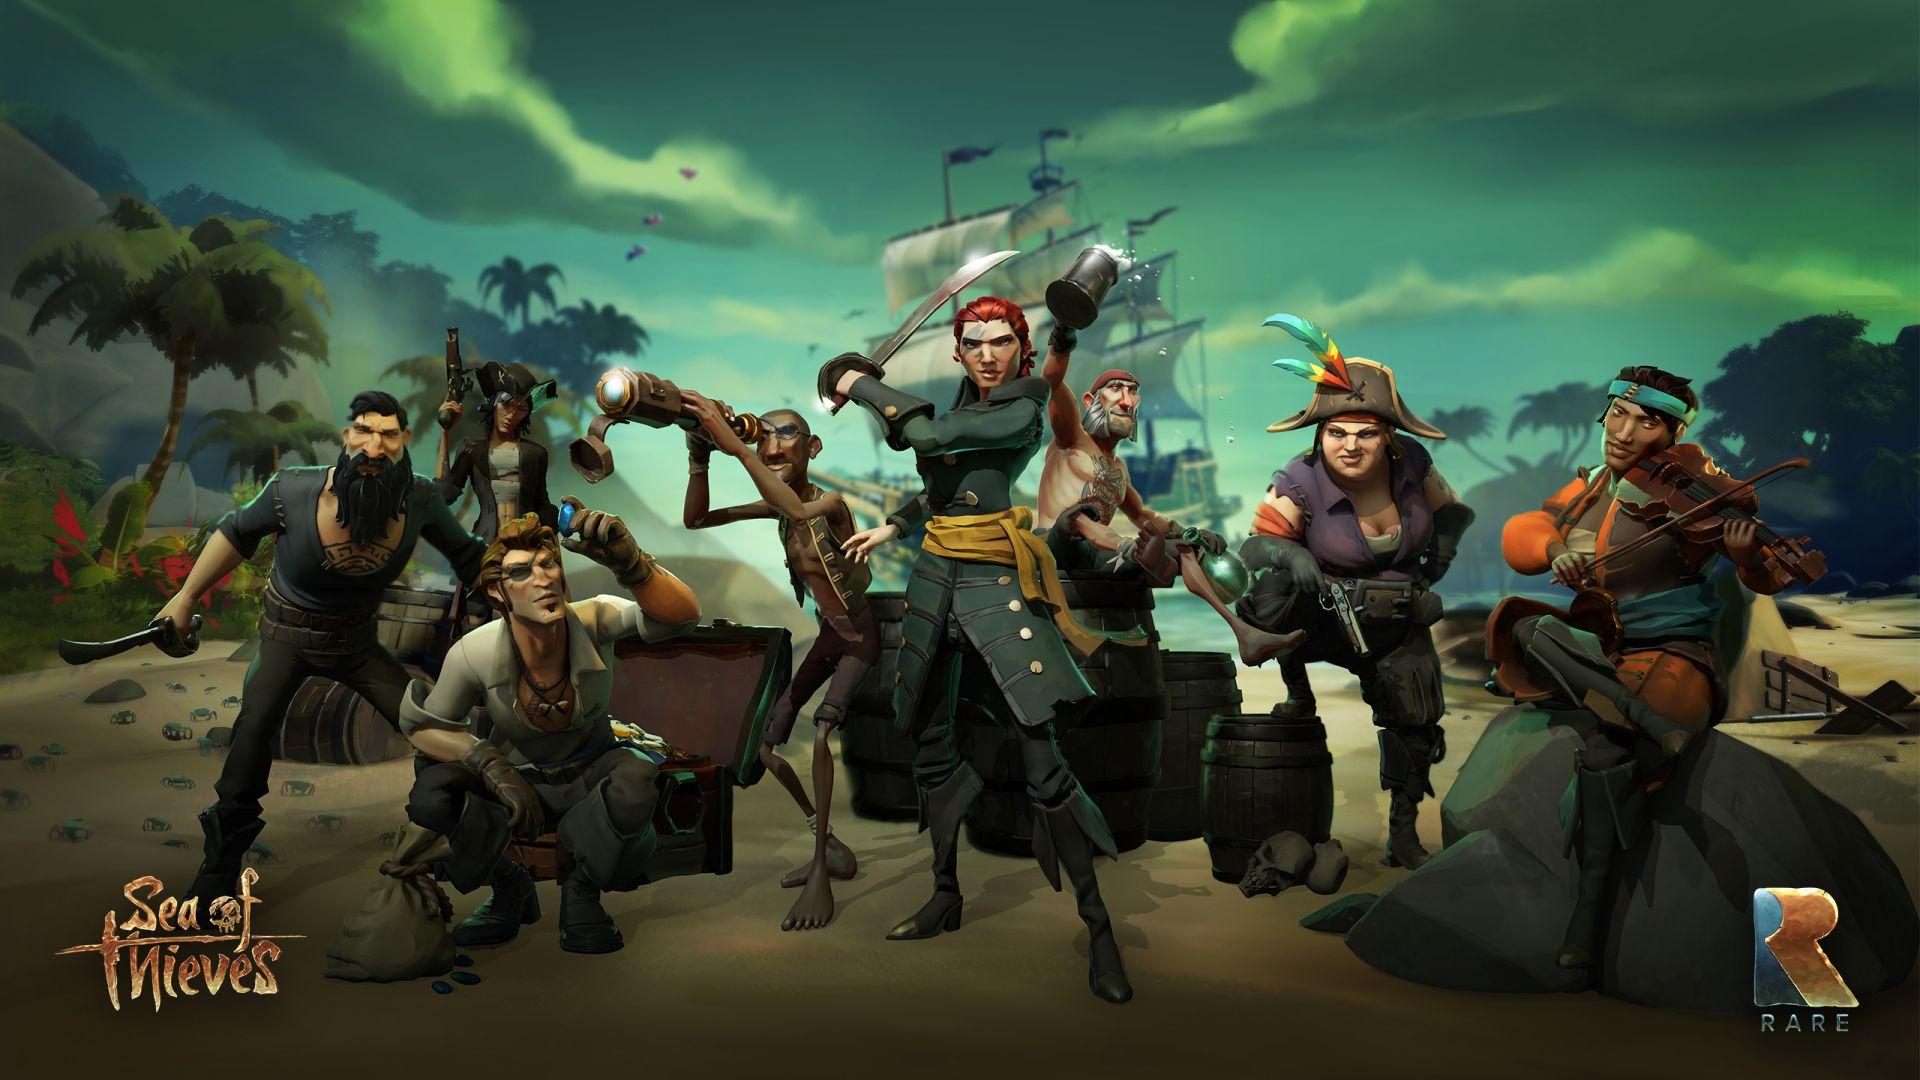 Wallpaper Pirates, Gang, Sea of thieves, 2018 game